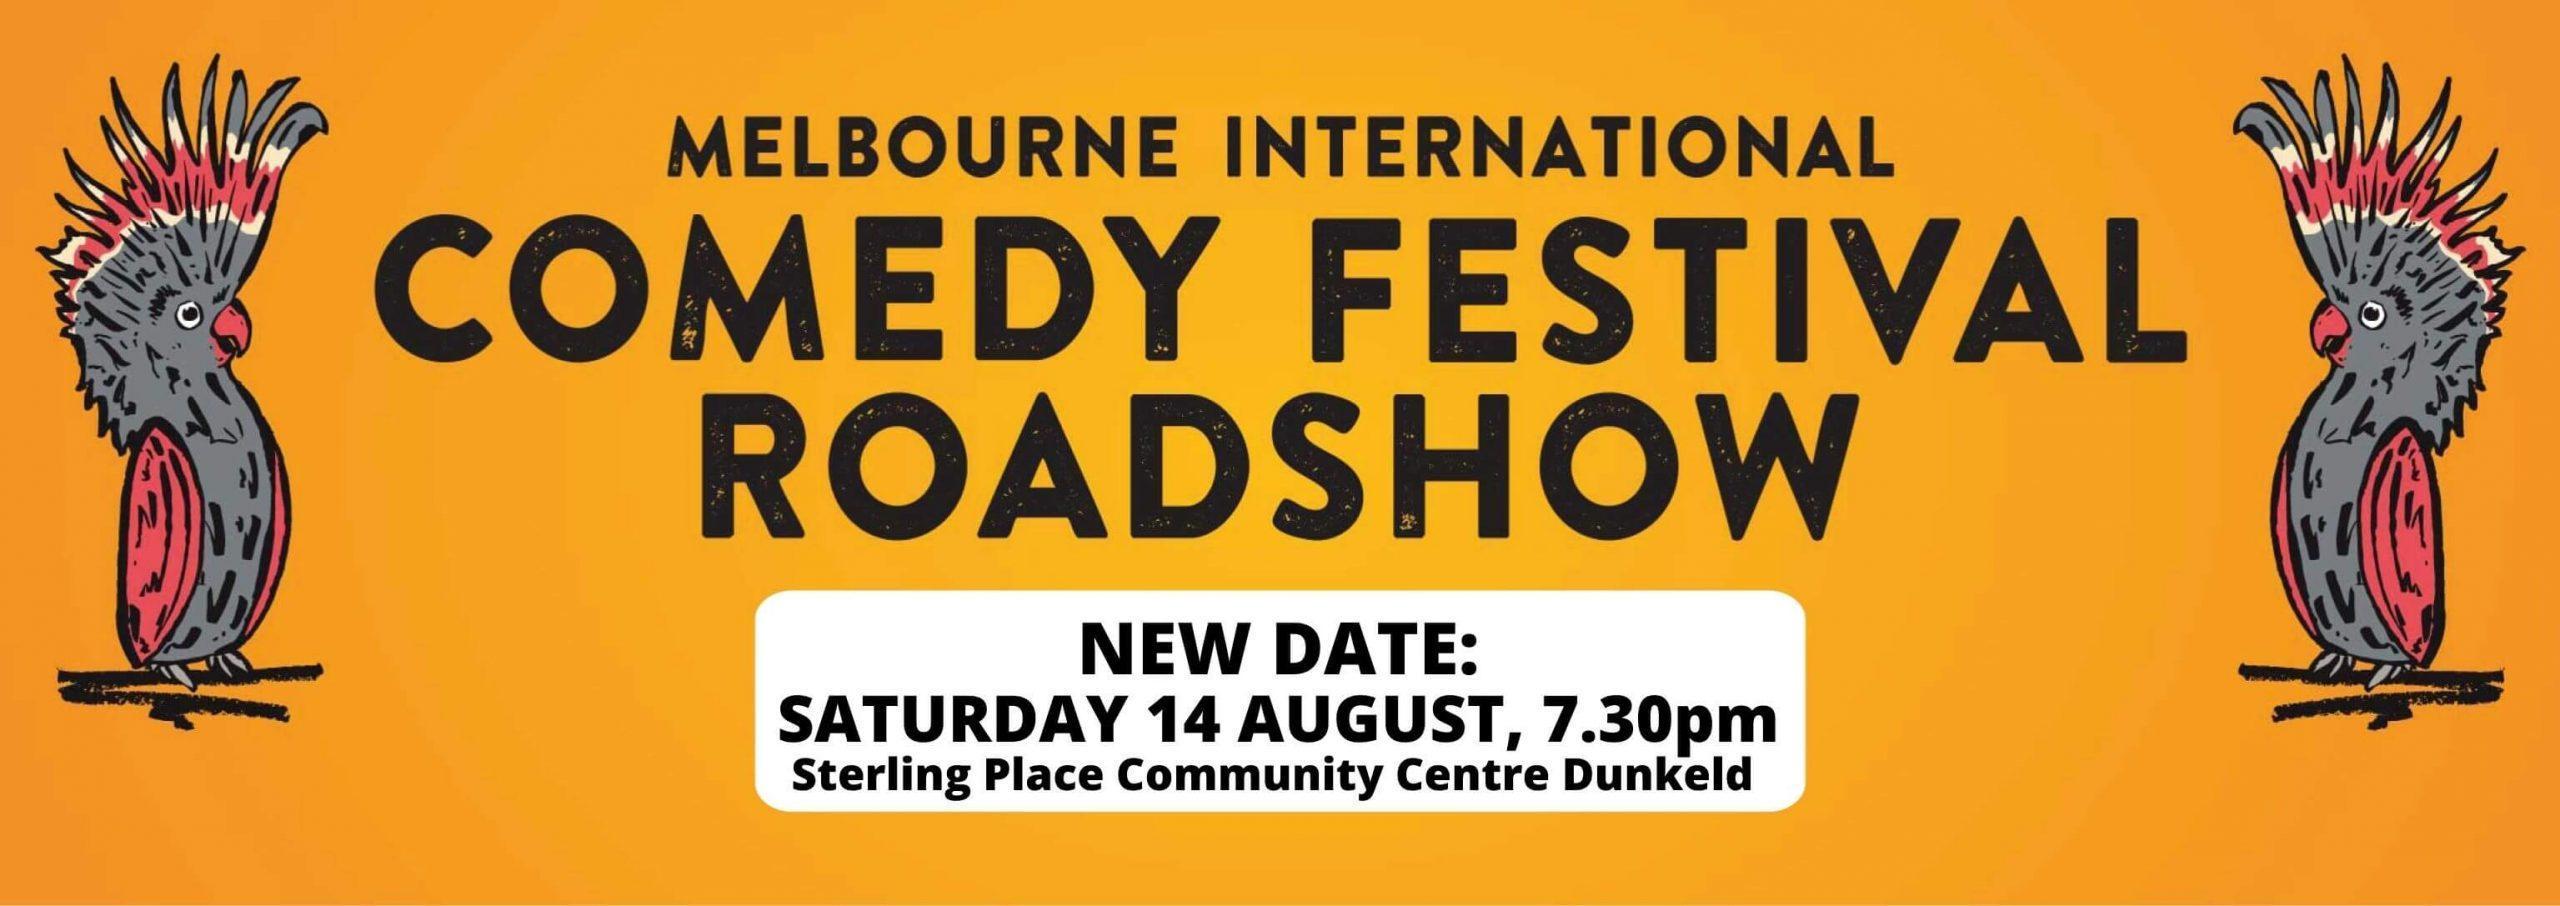 Comedy roadshow Dunkeld